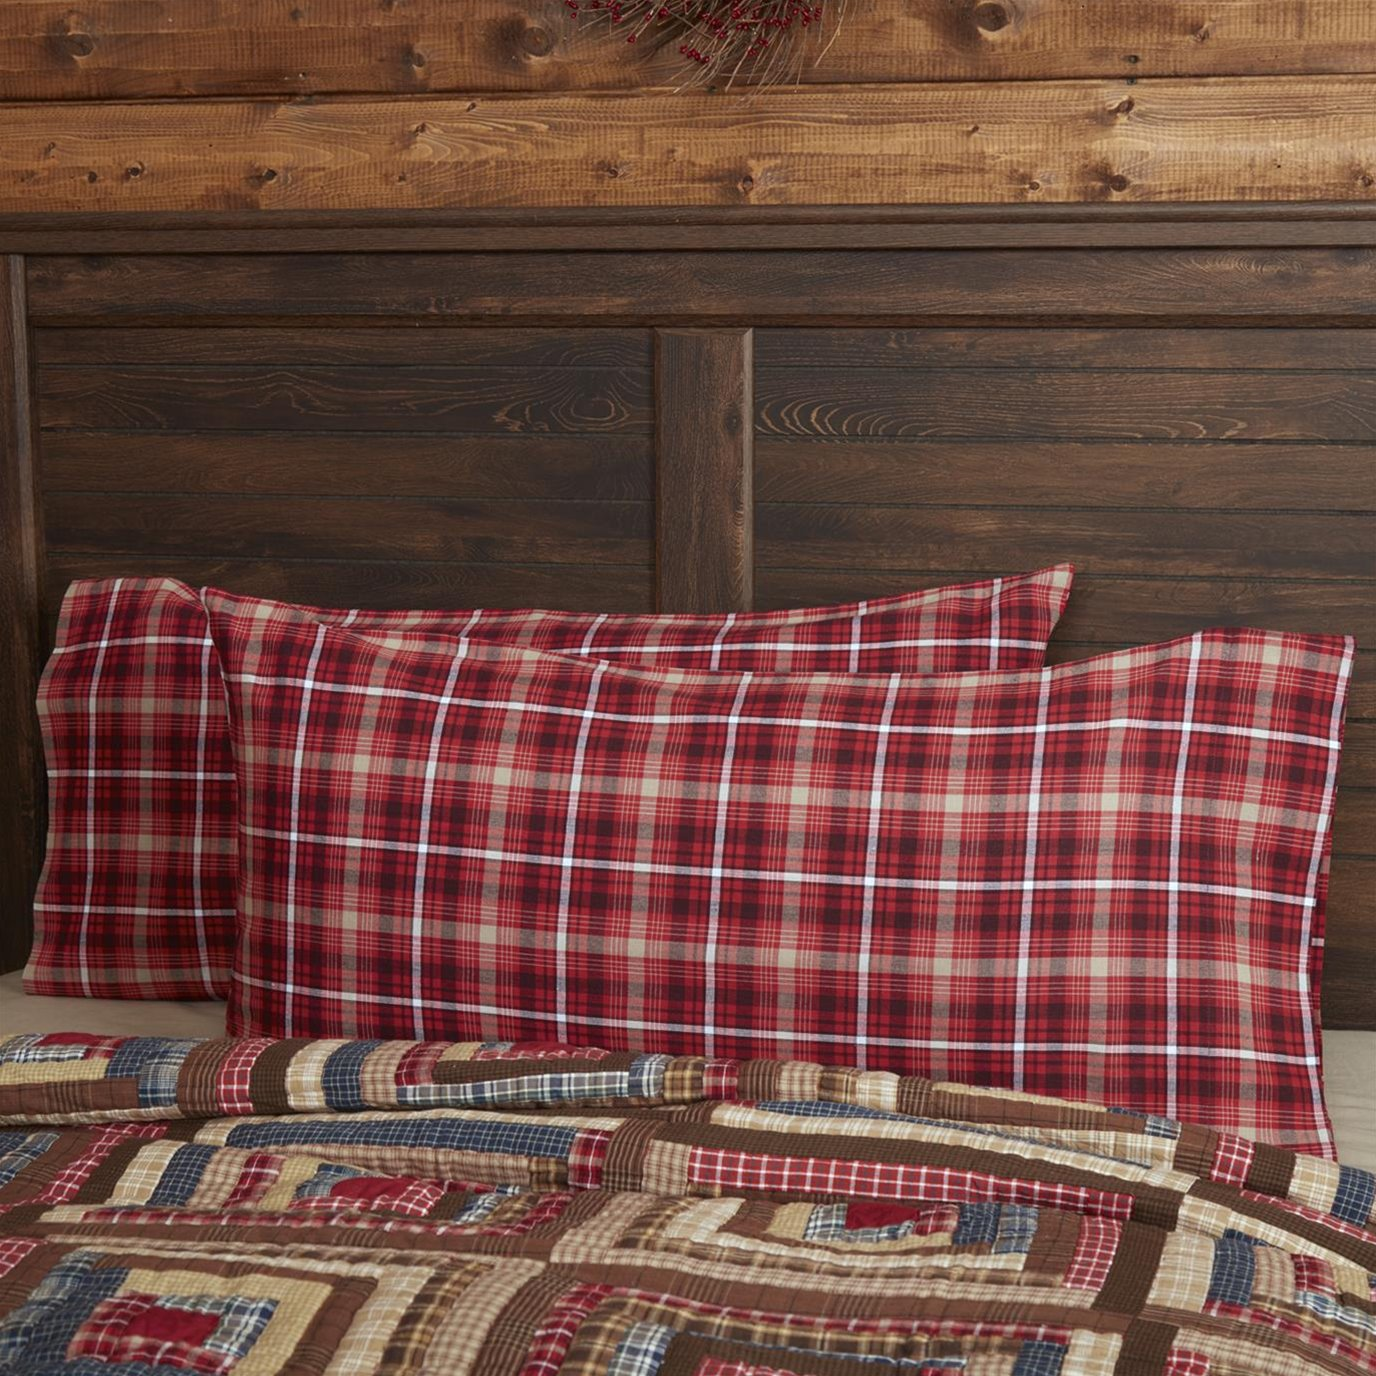 Braxton King Pillow Case Set of 2 21x40